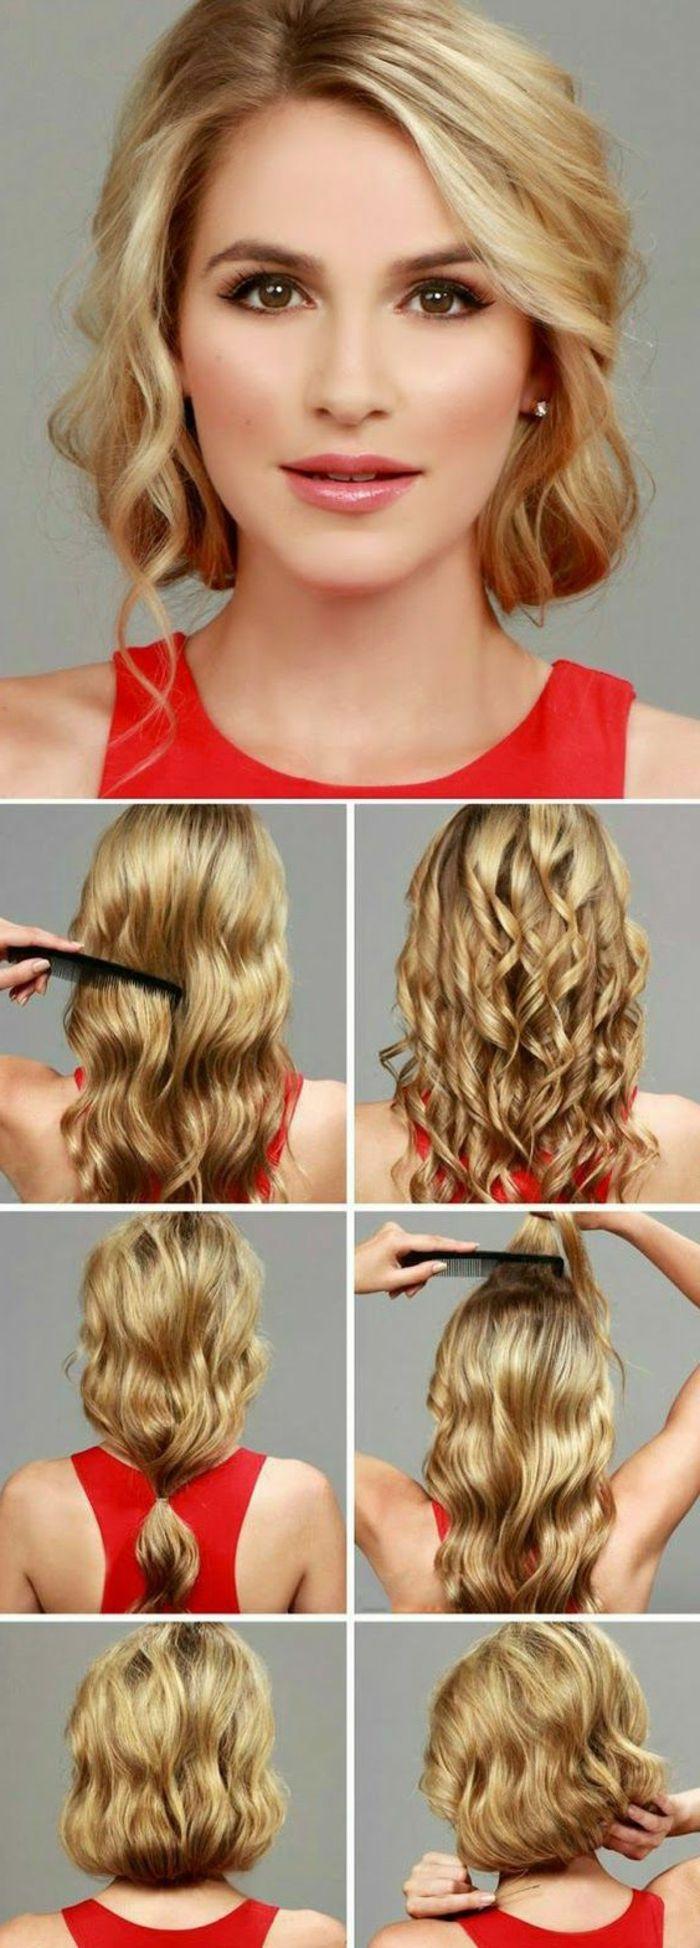 1001 Idees En Photo Pour Une Tenue Gatsby Reussie Hairstyles